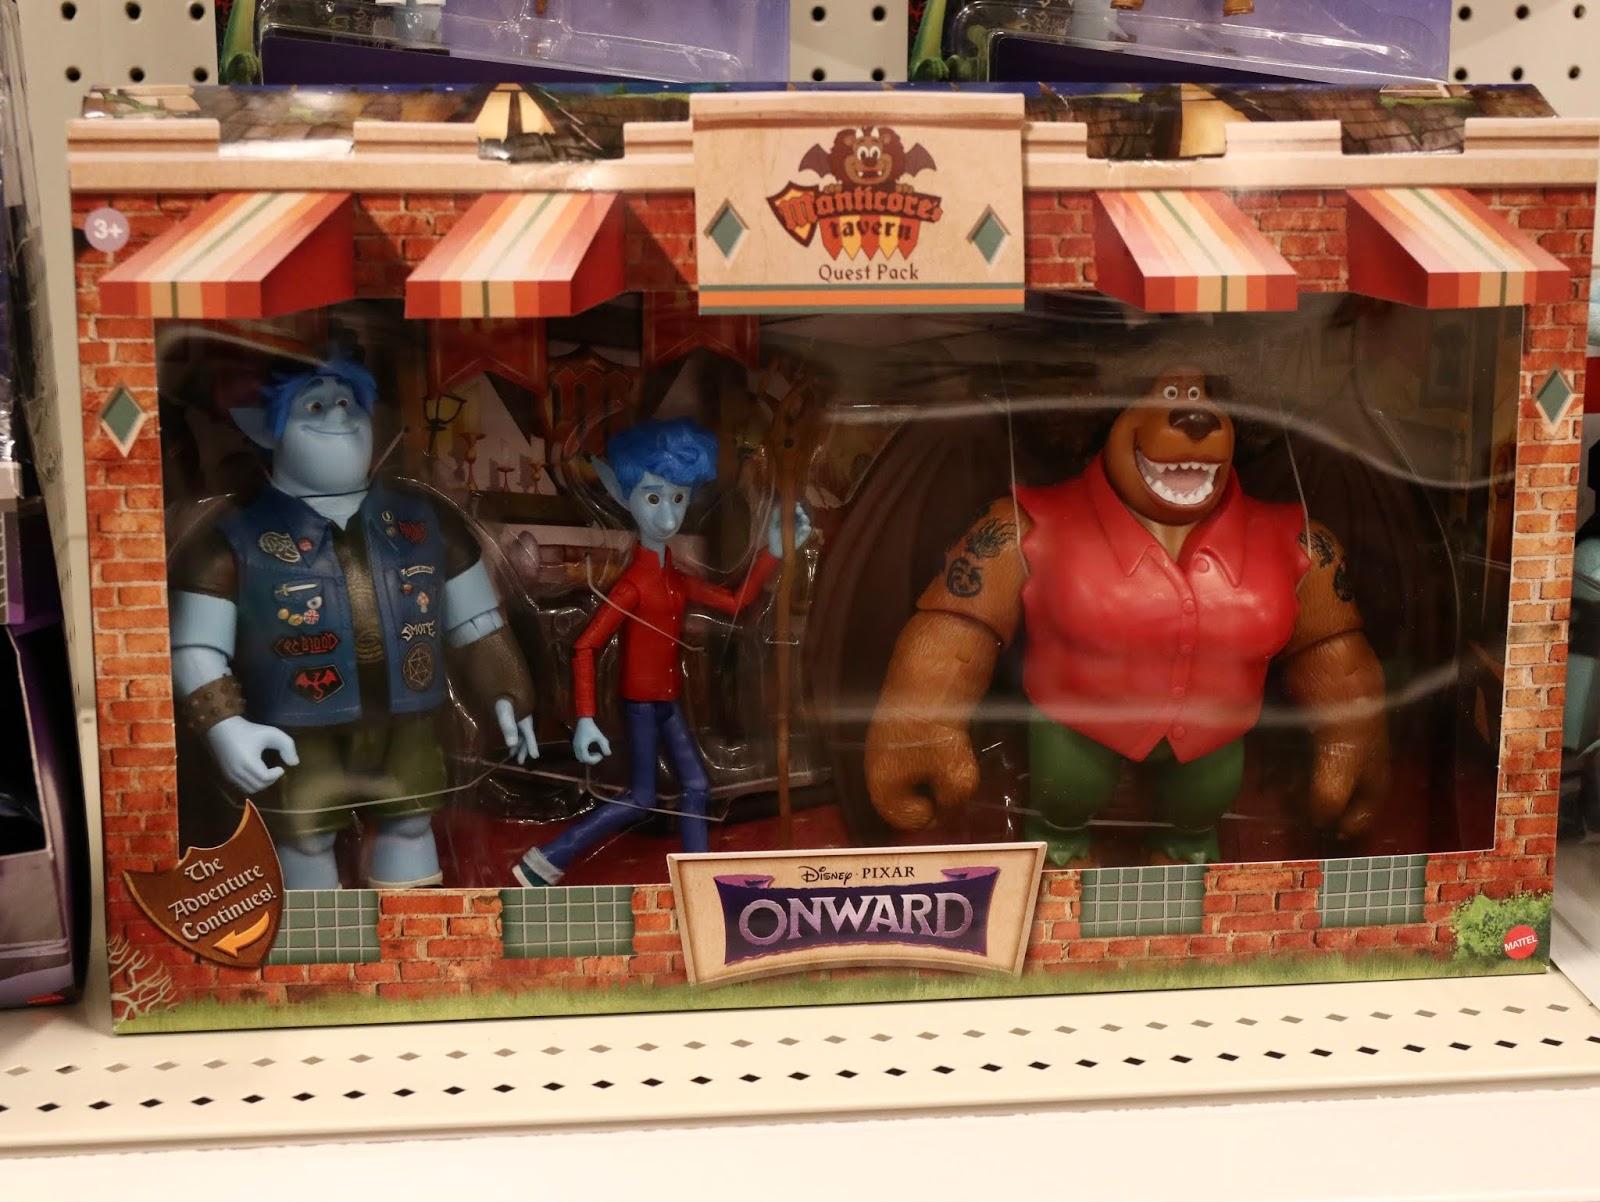 Pixar onward action figures, Ian, Barley and Manticore